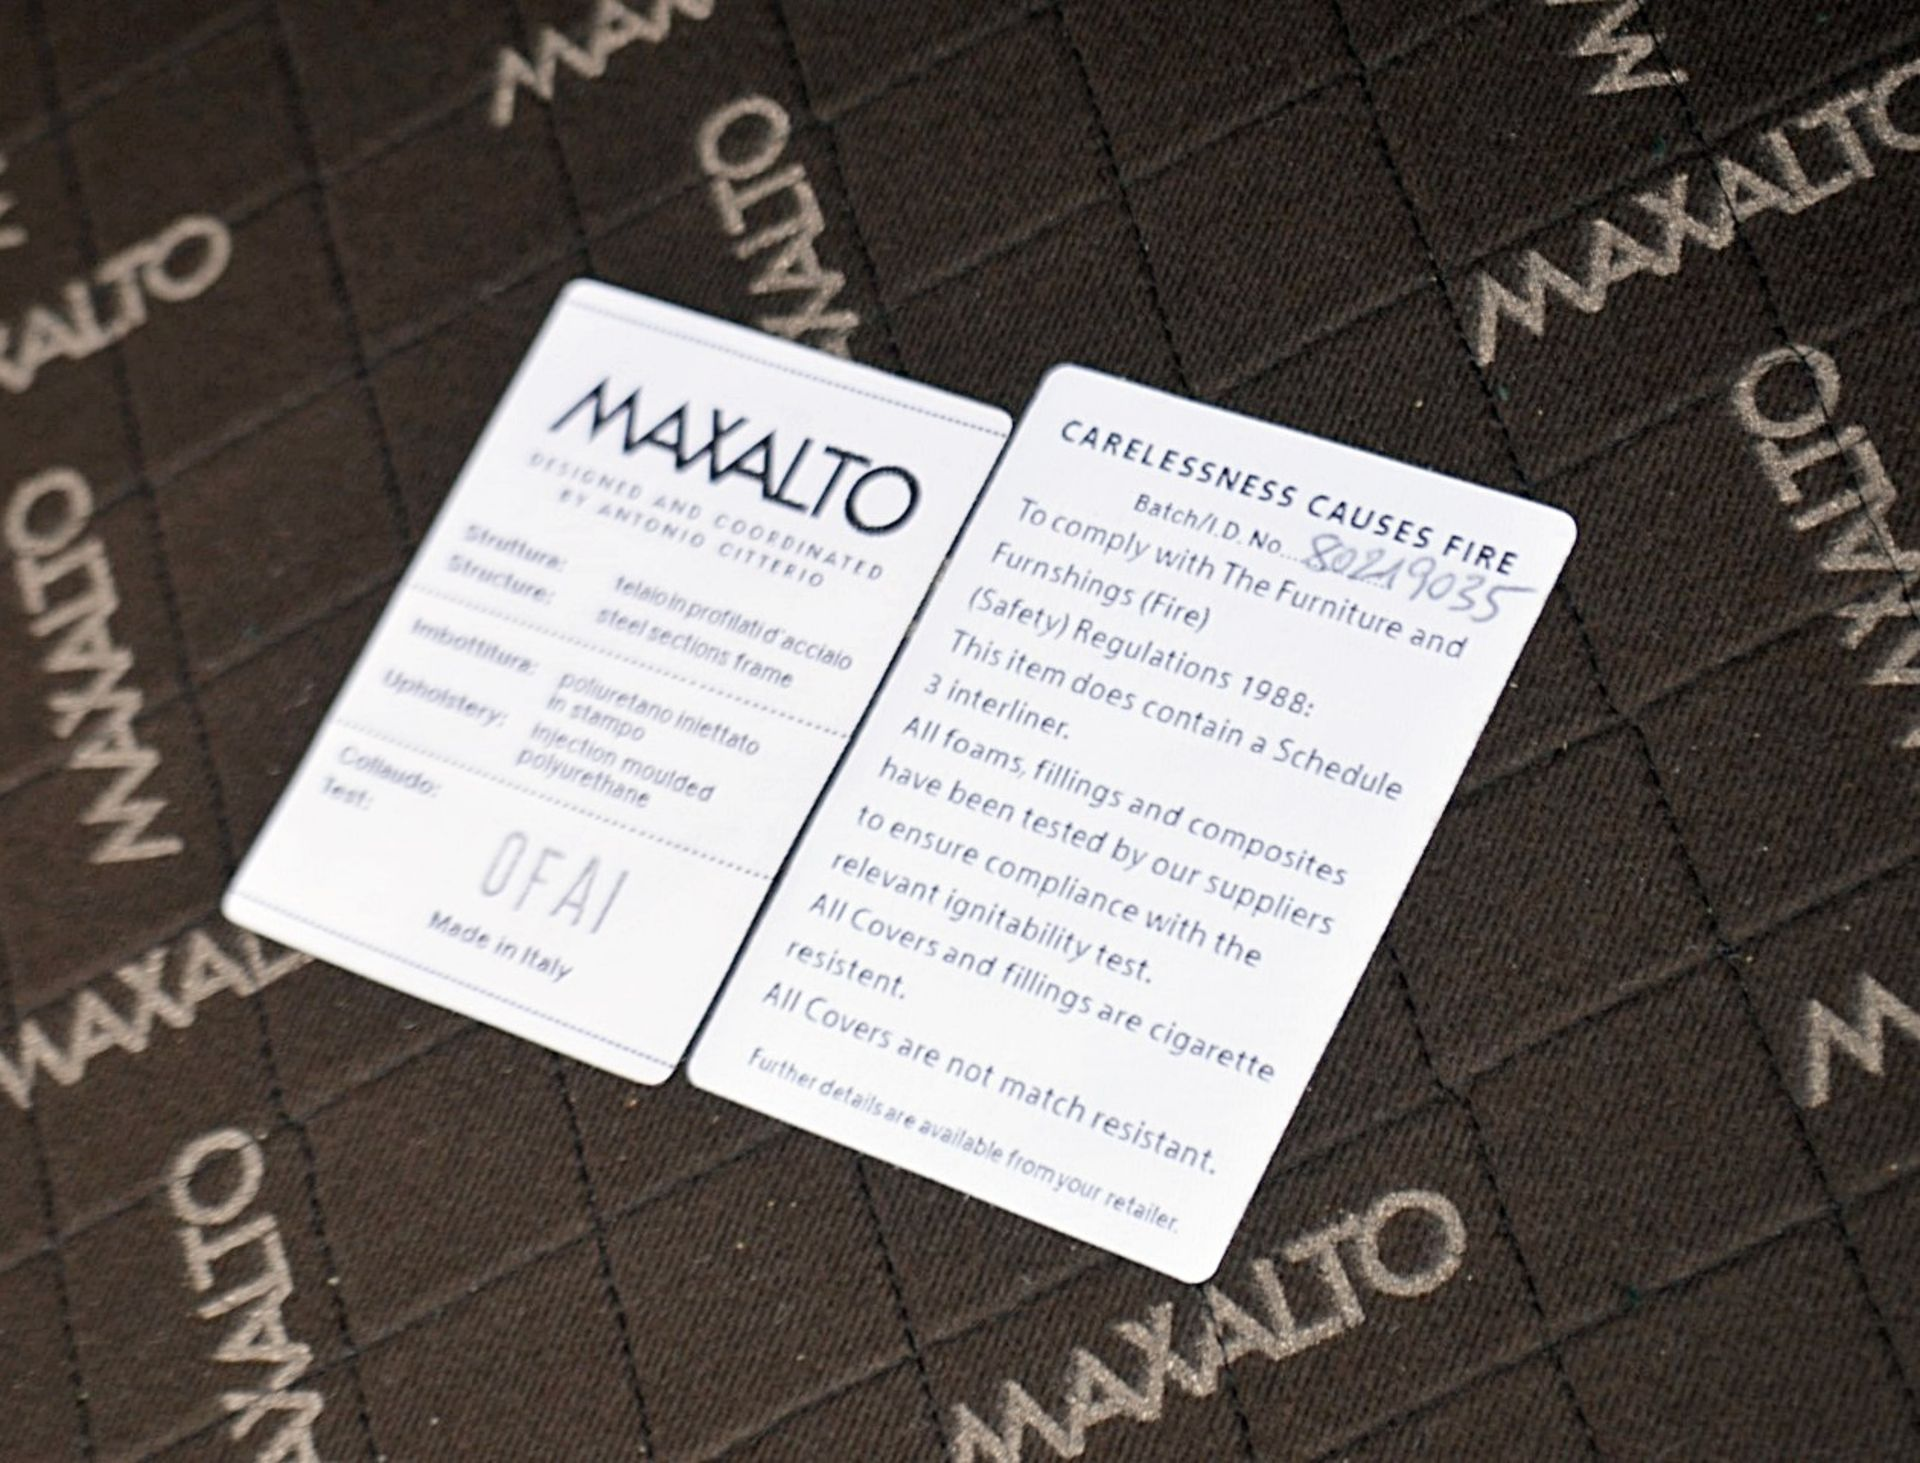 2 x B&B Italia MAXALTO Luxury Sofa Sections Both Upholstered In Rich Dark Green Velvet - RRP £7,248 - Image 6 of 13